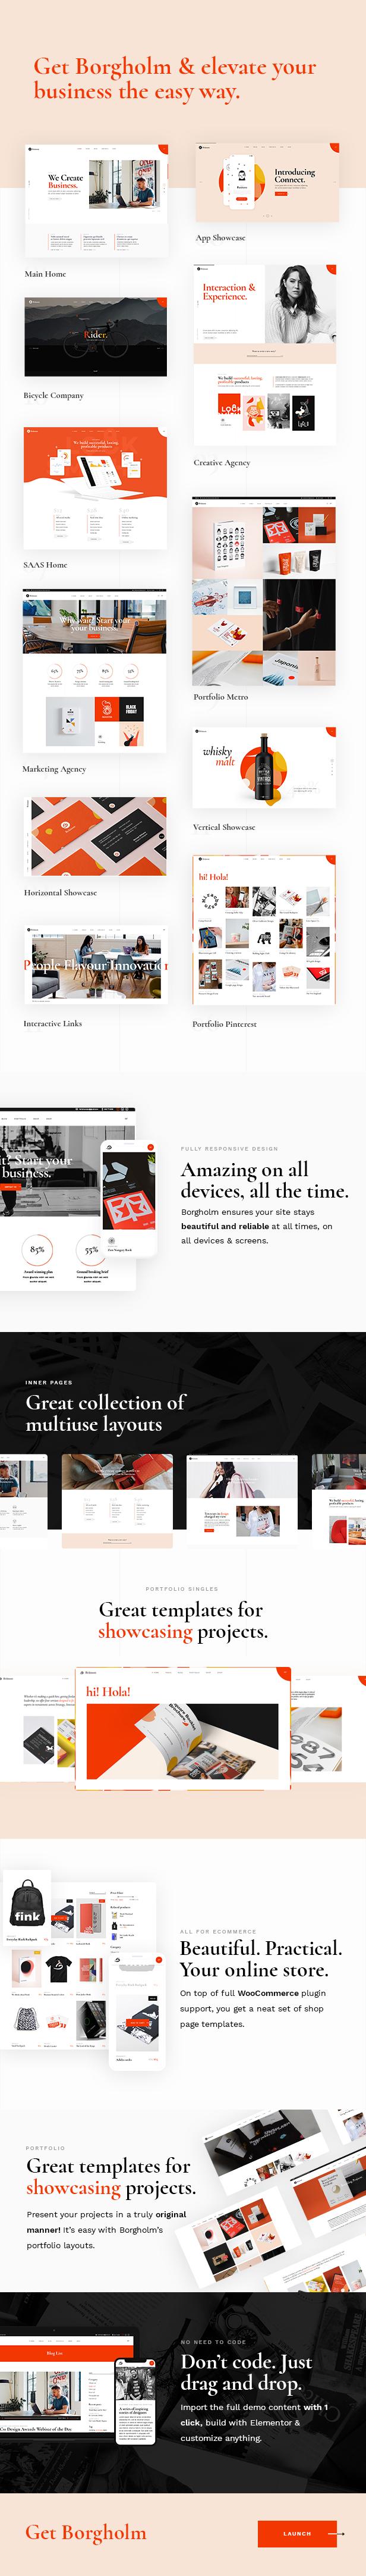 Borgholm - Marketing Agency Theme - 1